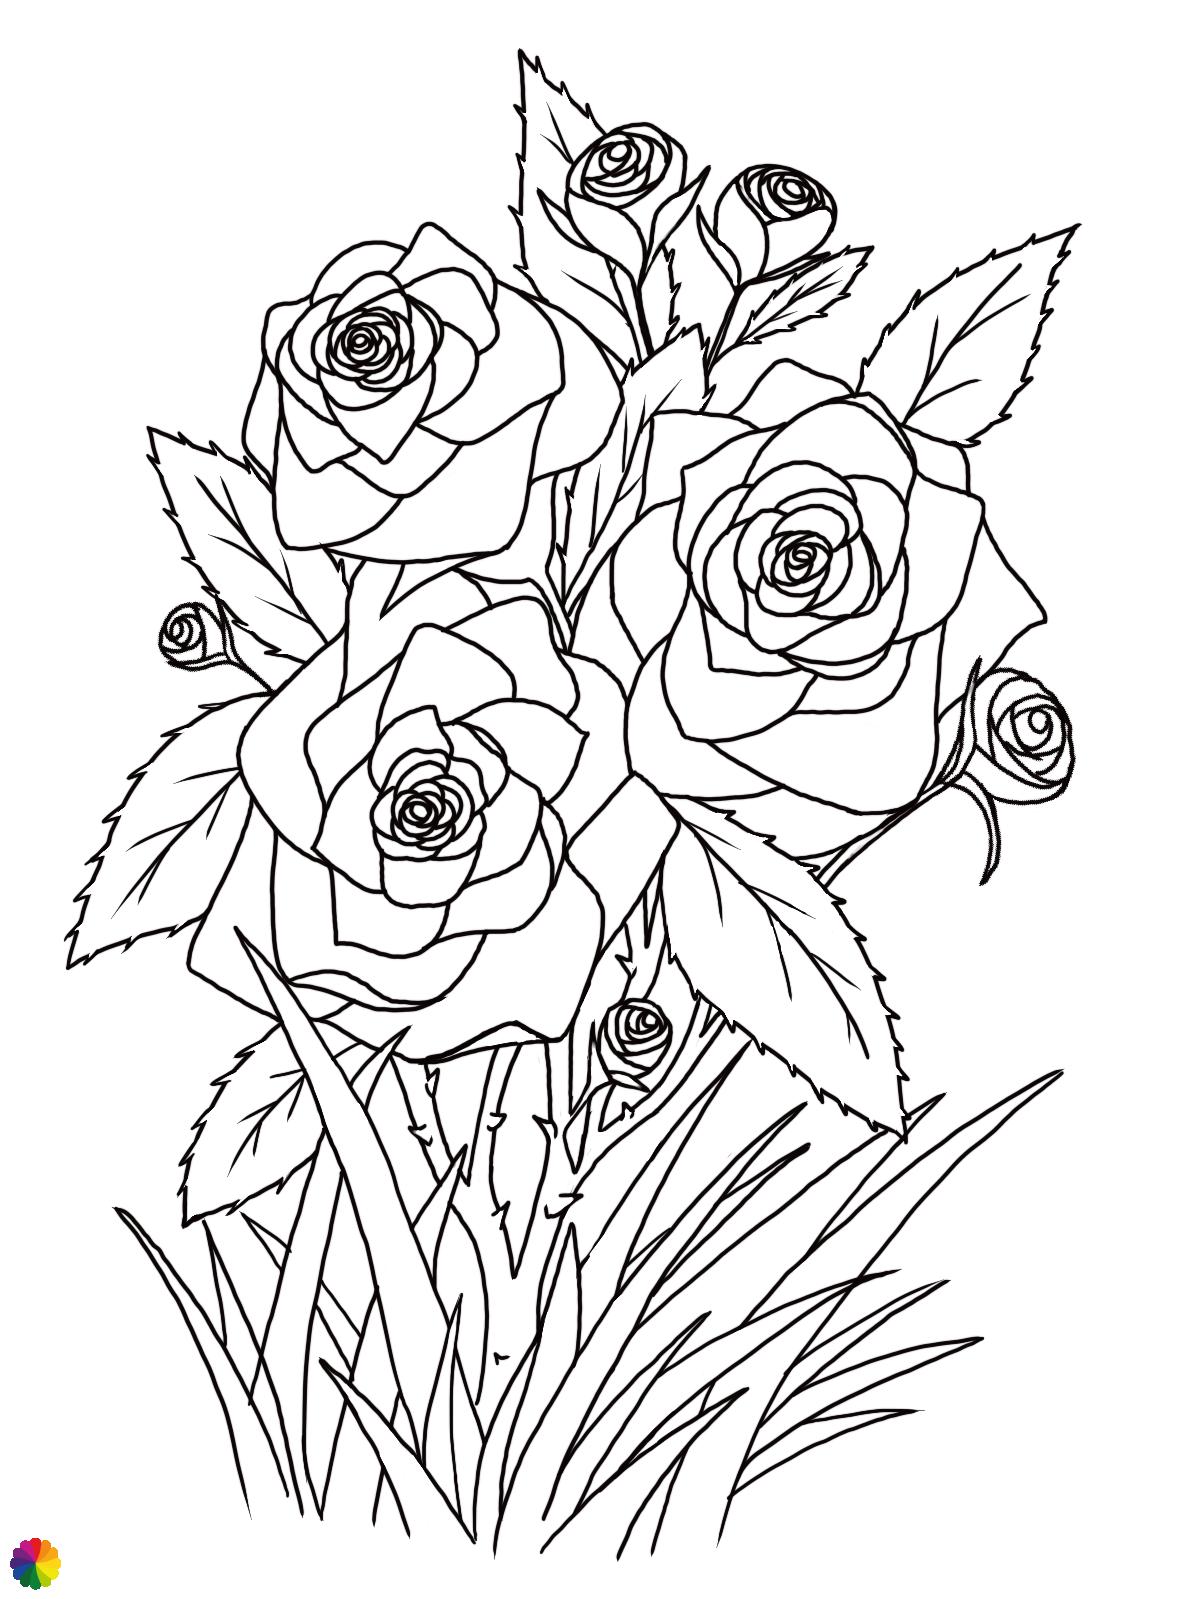 Rozen-tattoo in lijnen